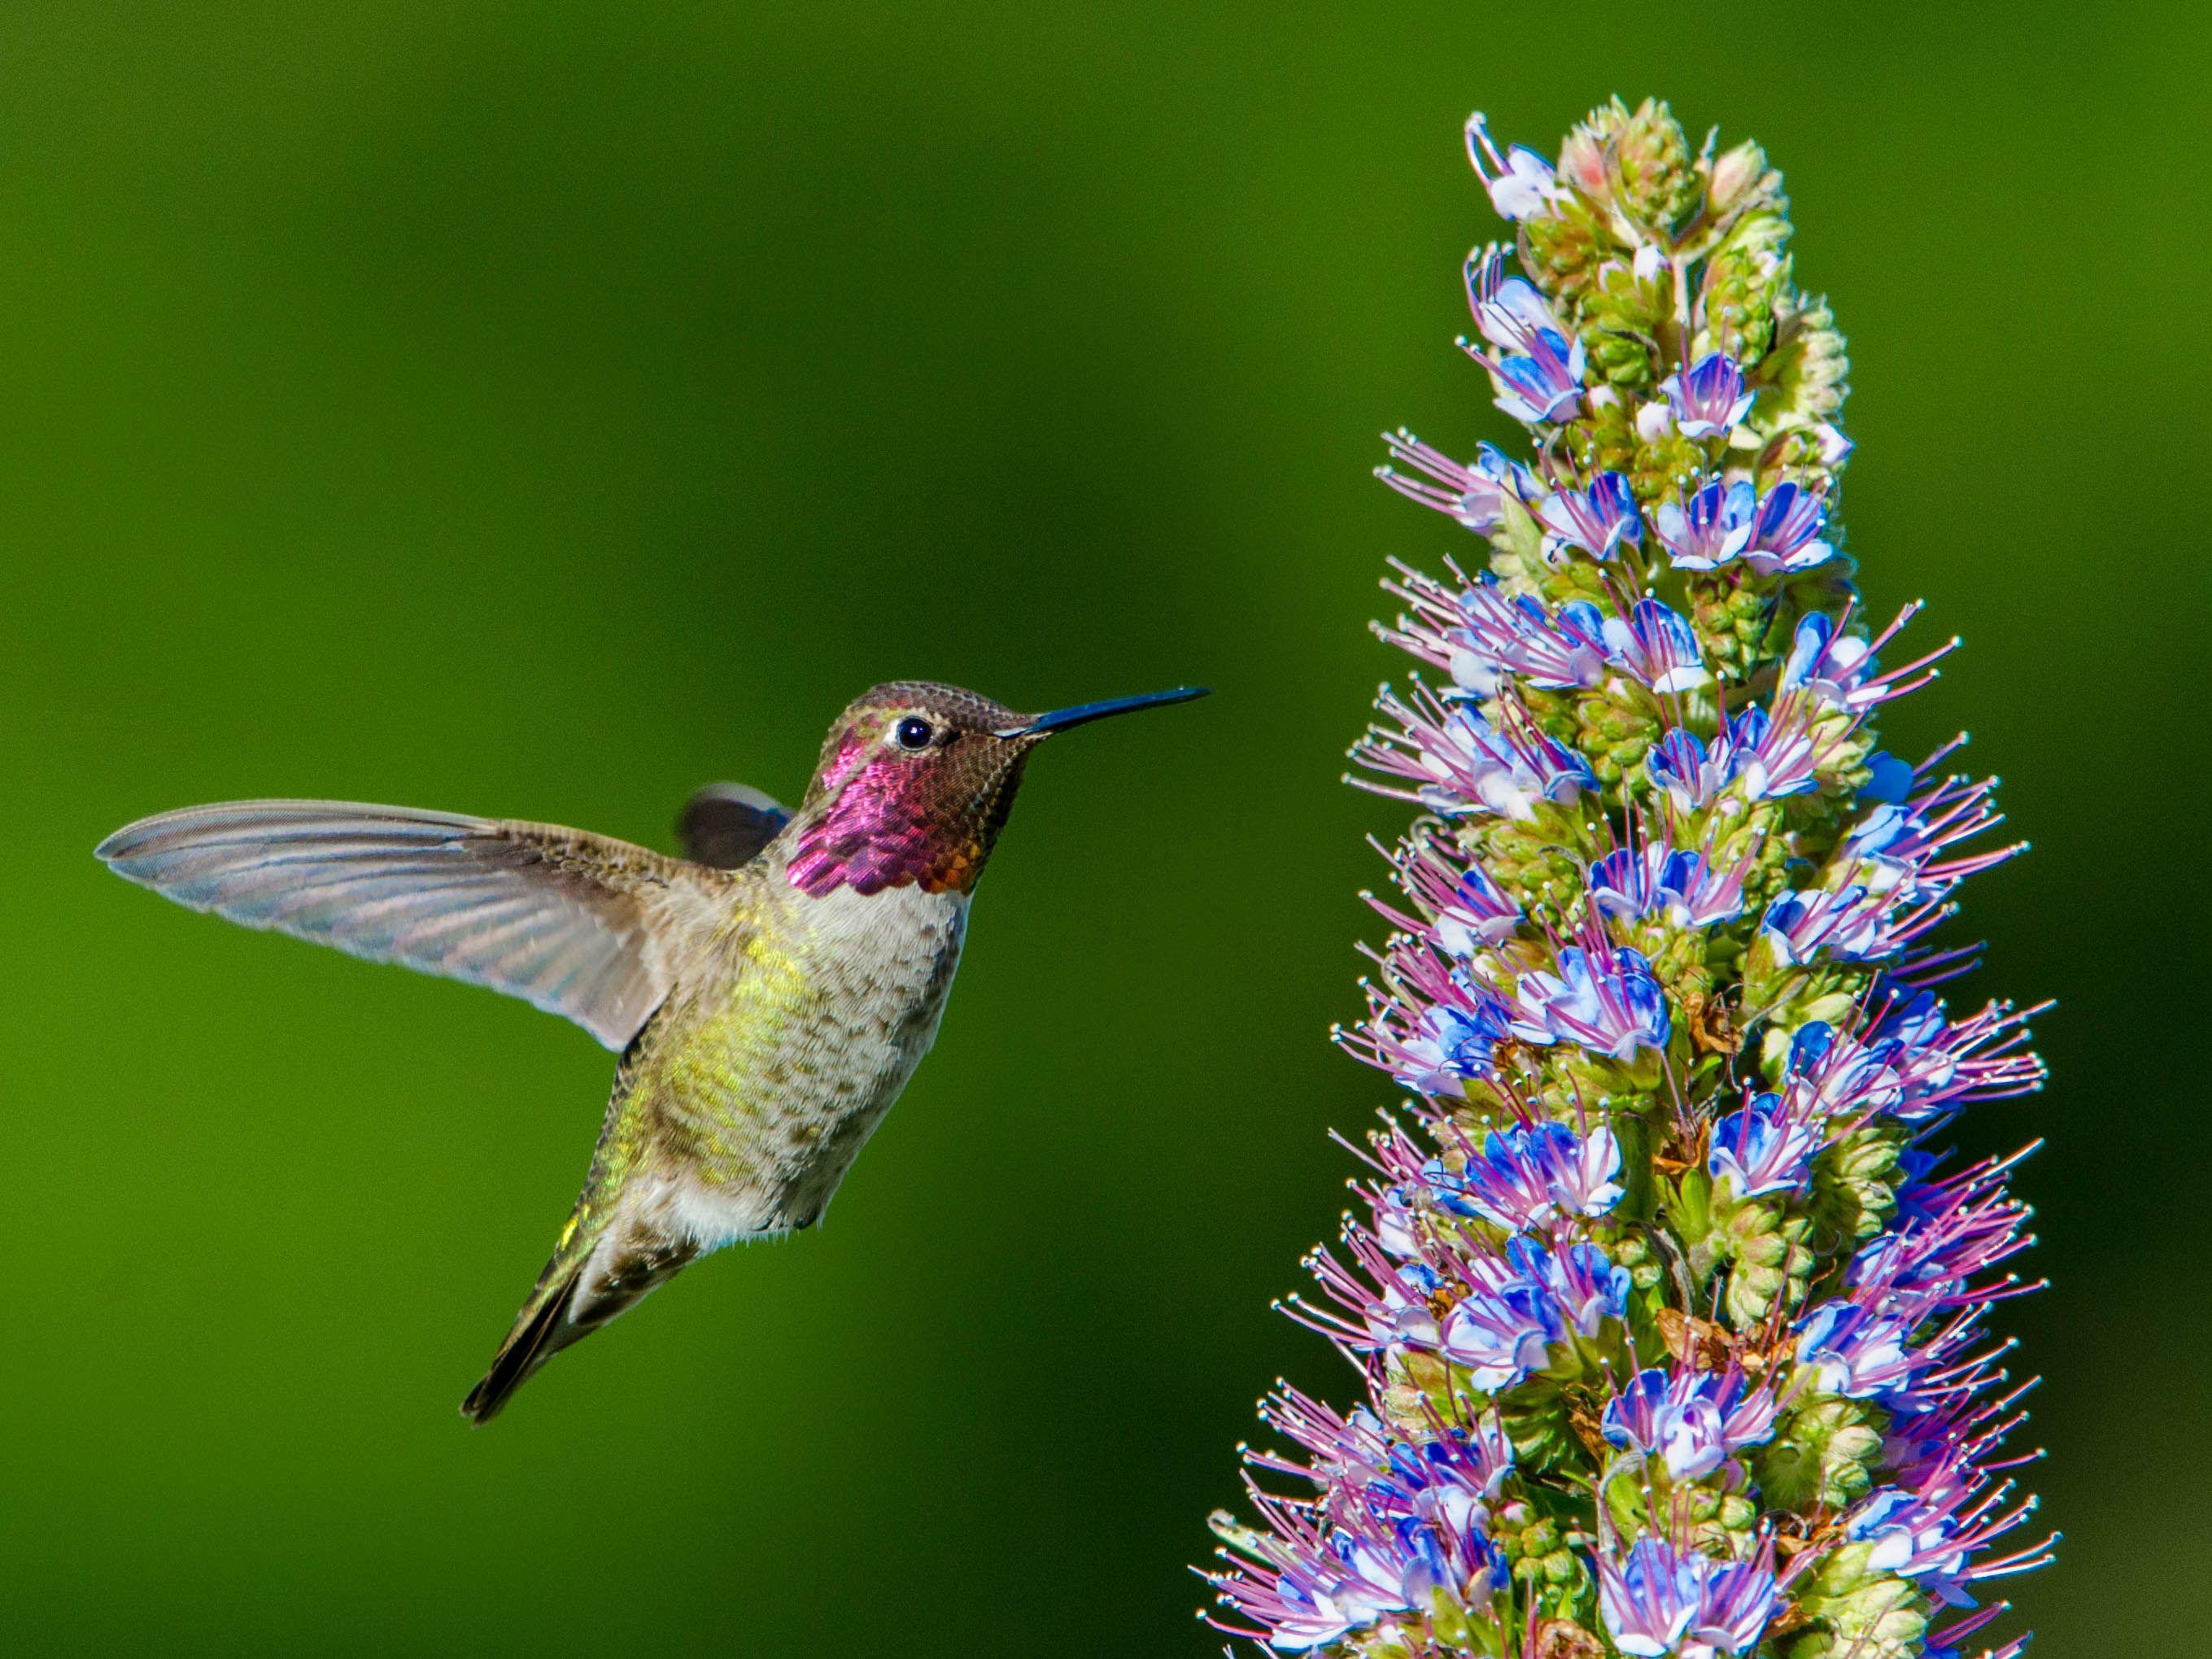 Anna's Hummingbird by Paul Brewer